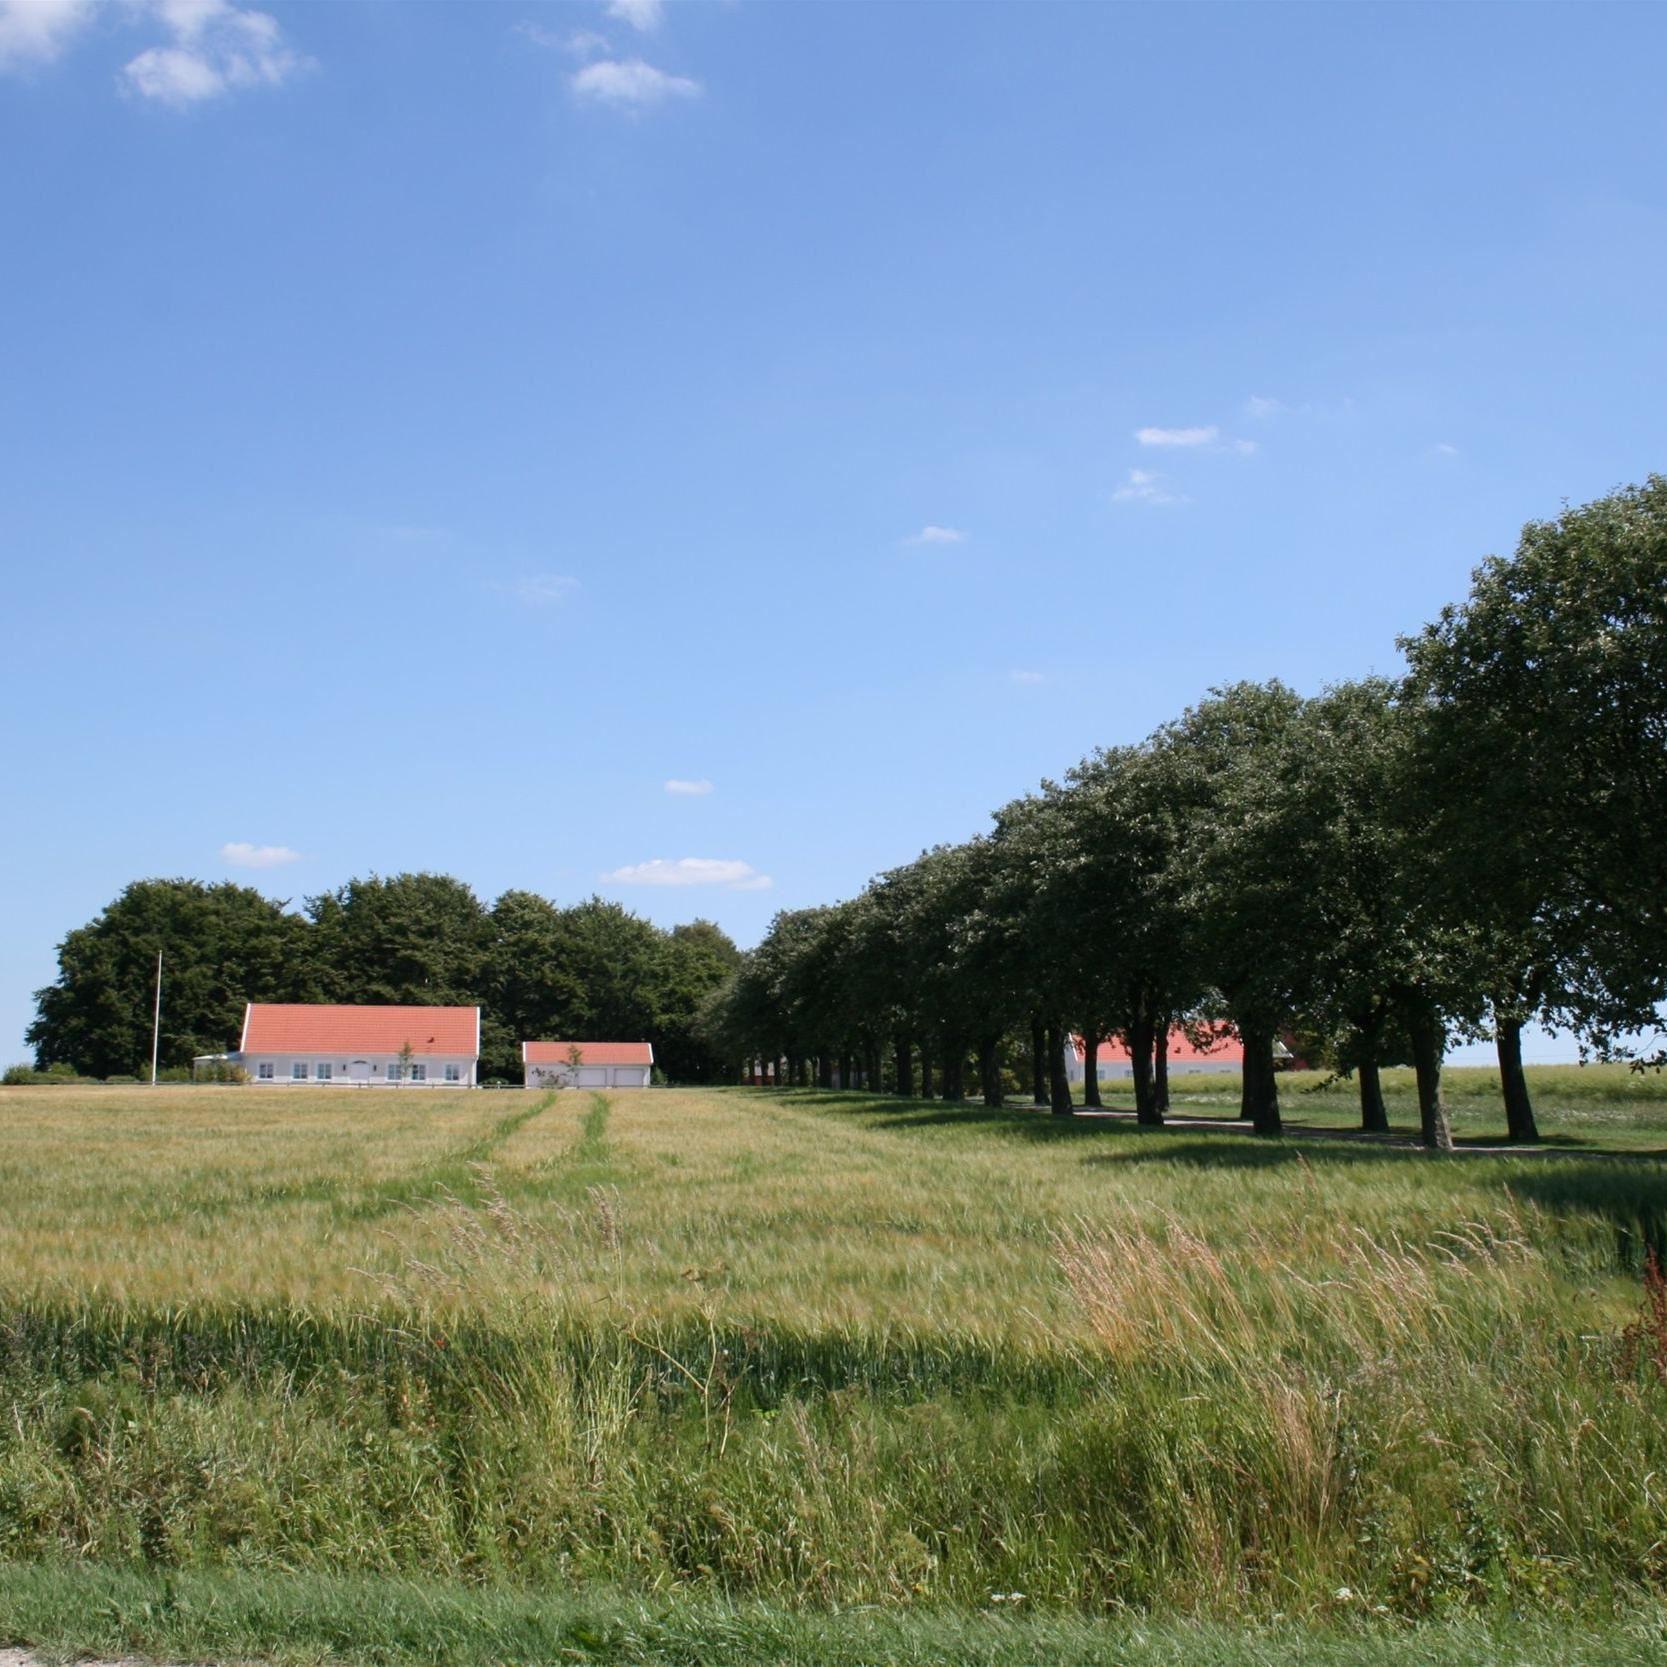 © Kävlinge kommun, Wirketorp Countryside Hotel